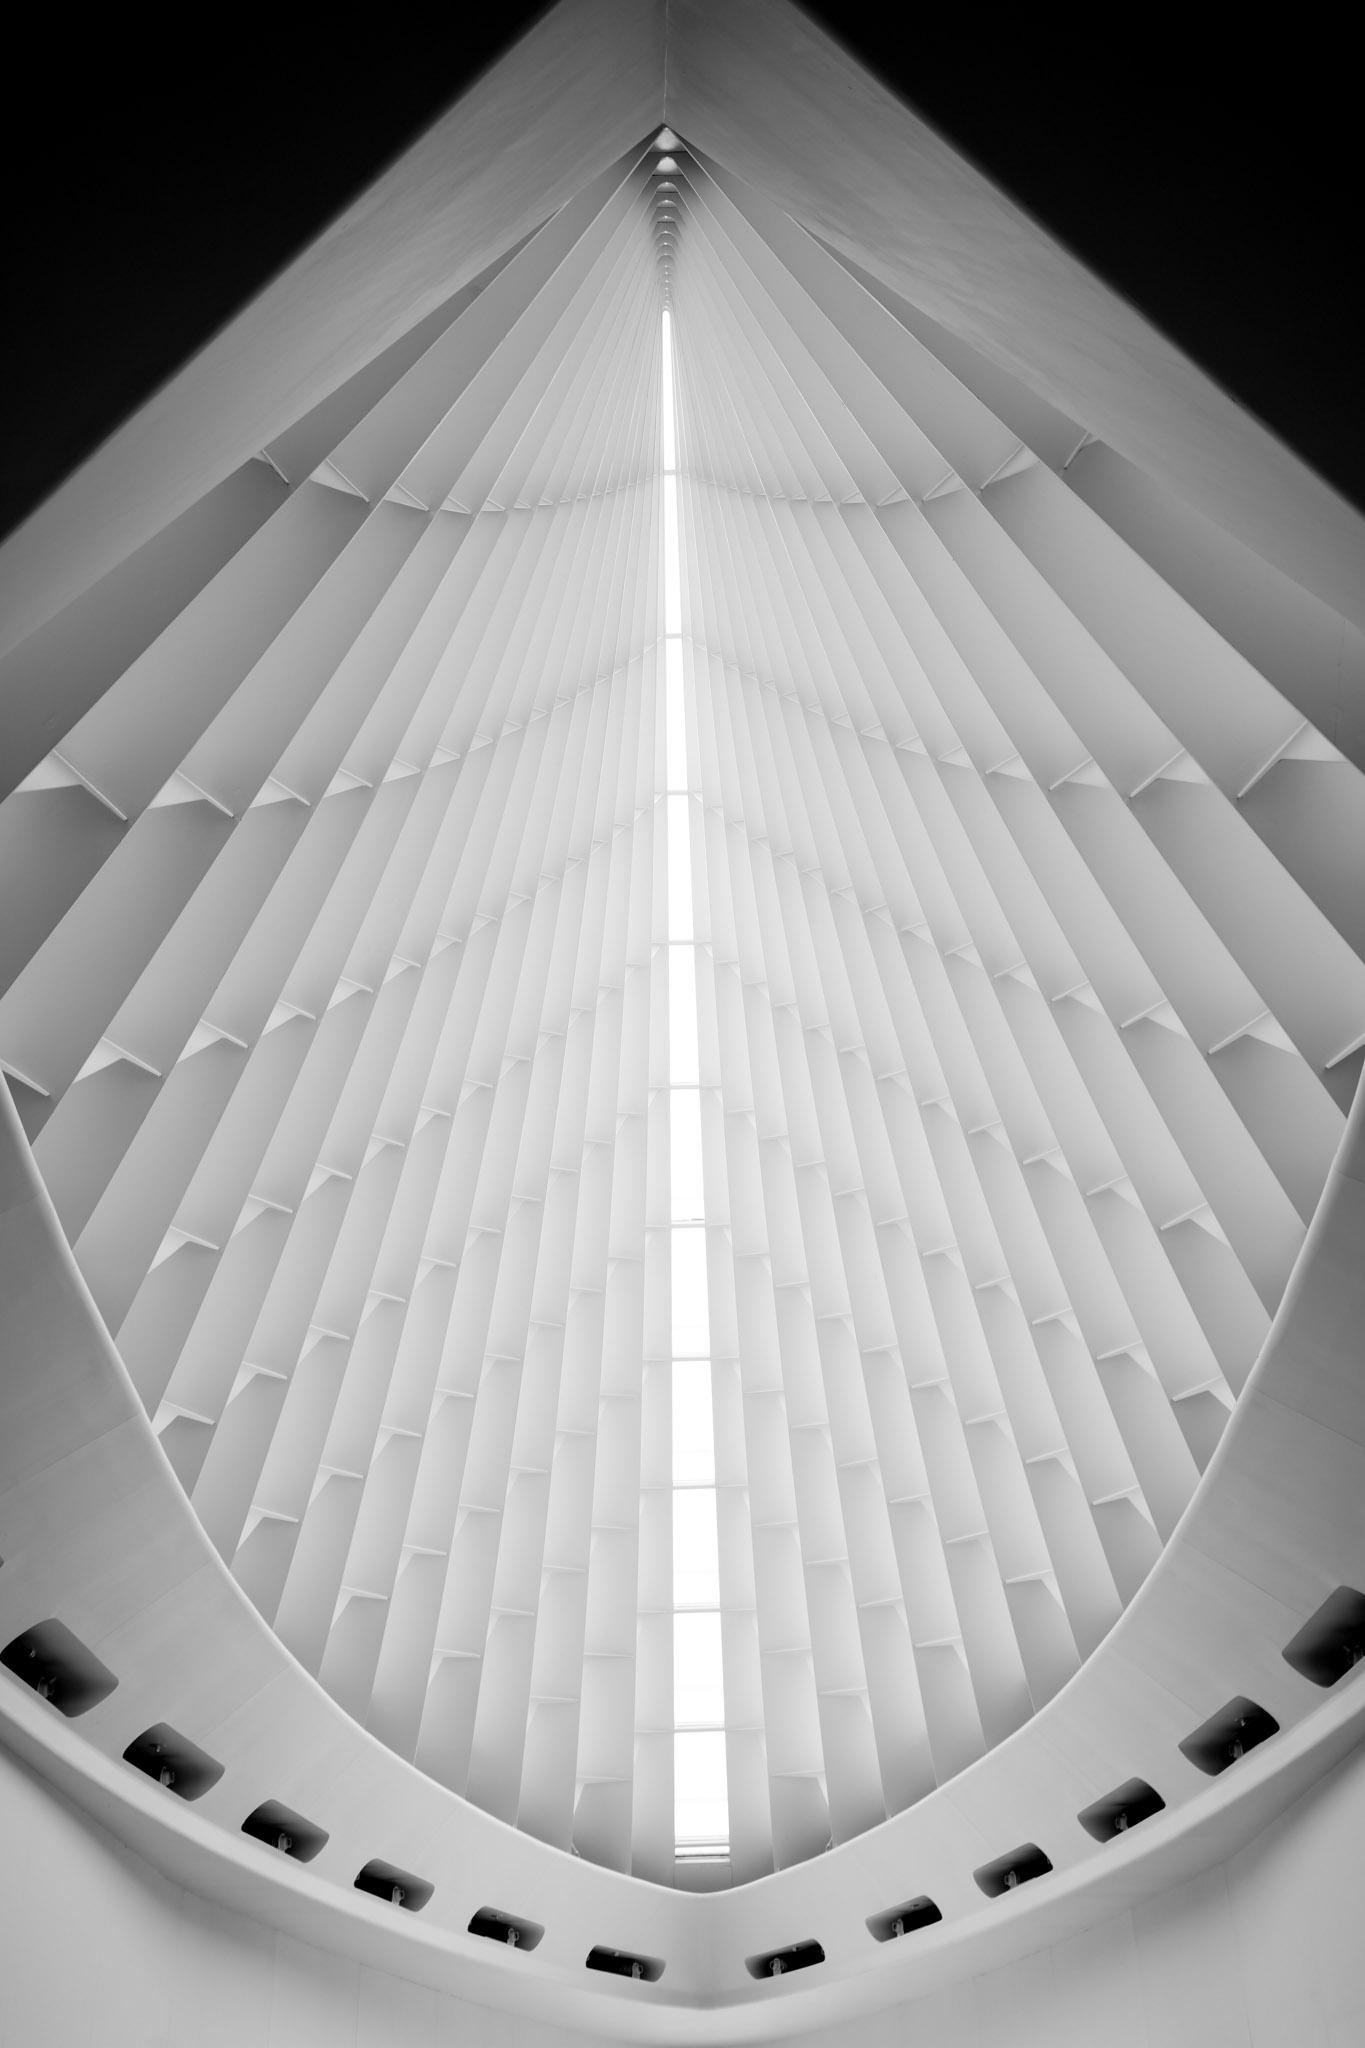 Grayscale Milwaukee Art Museum  - adam_dooley | ello